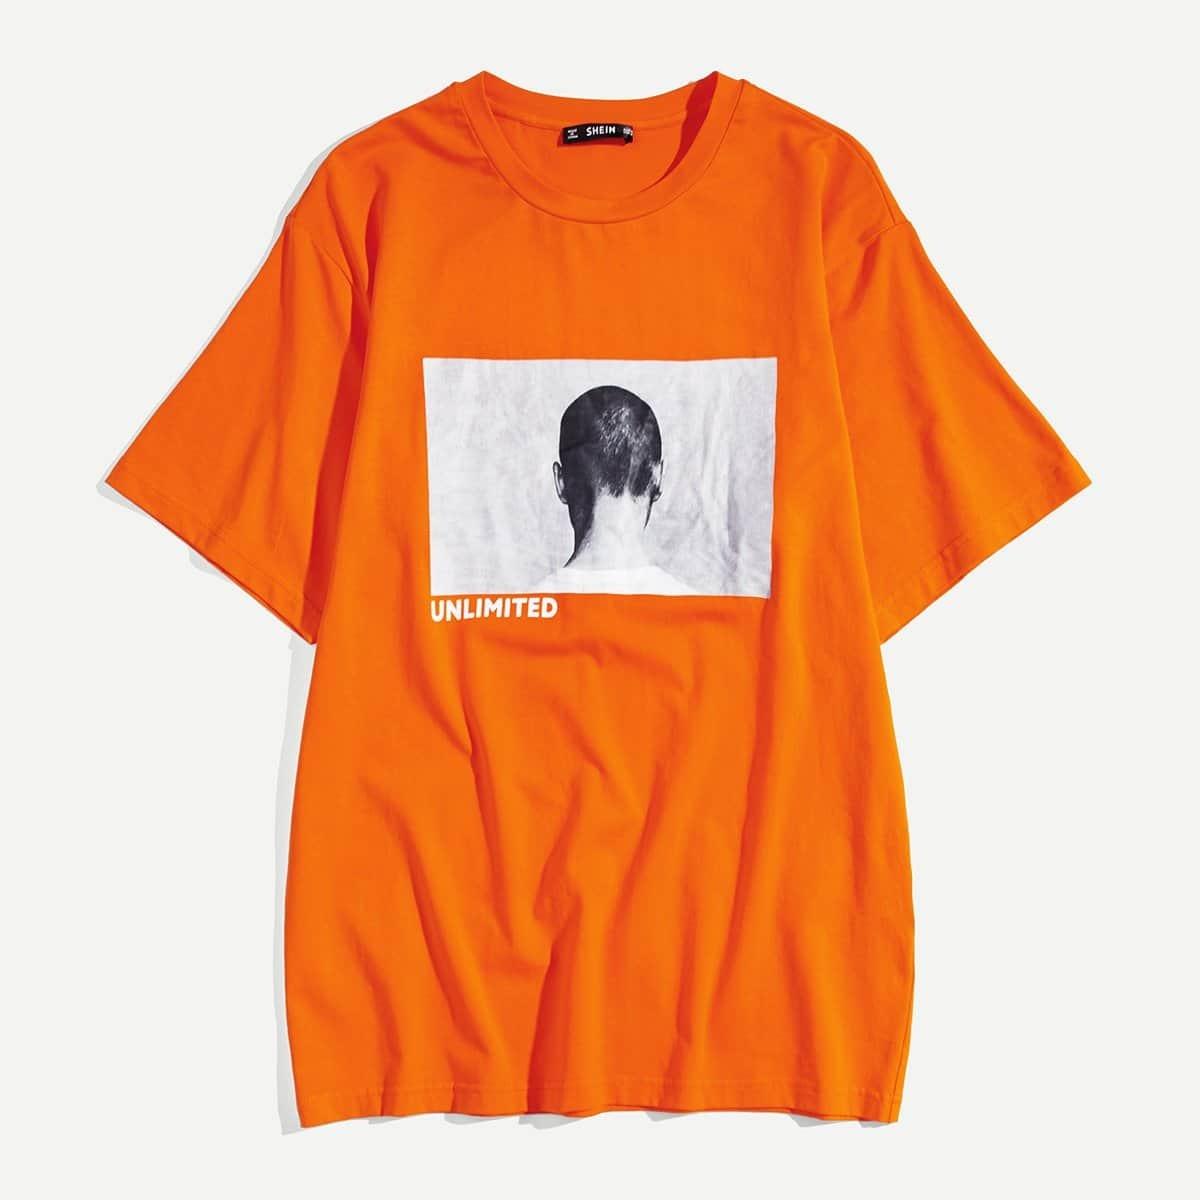 Mannen T-shirt met Letterprint en Figuratieve Opdruk